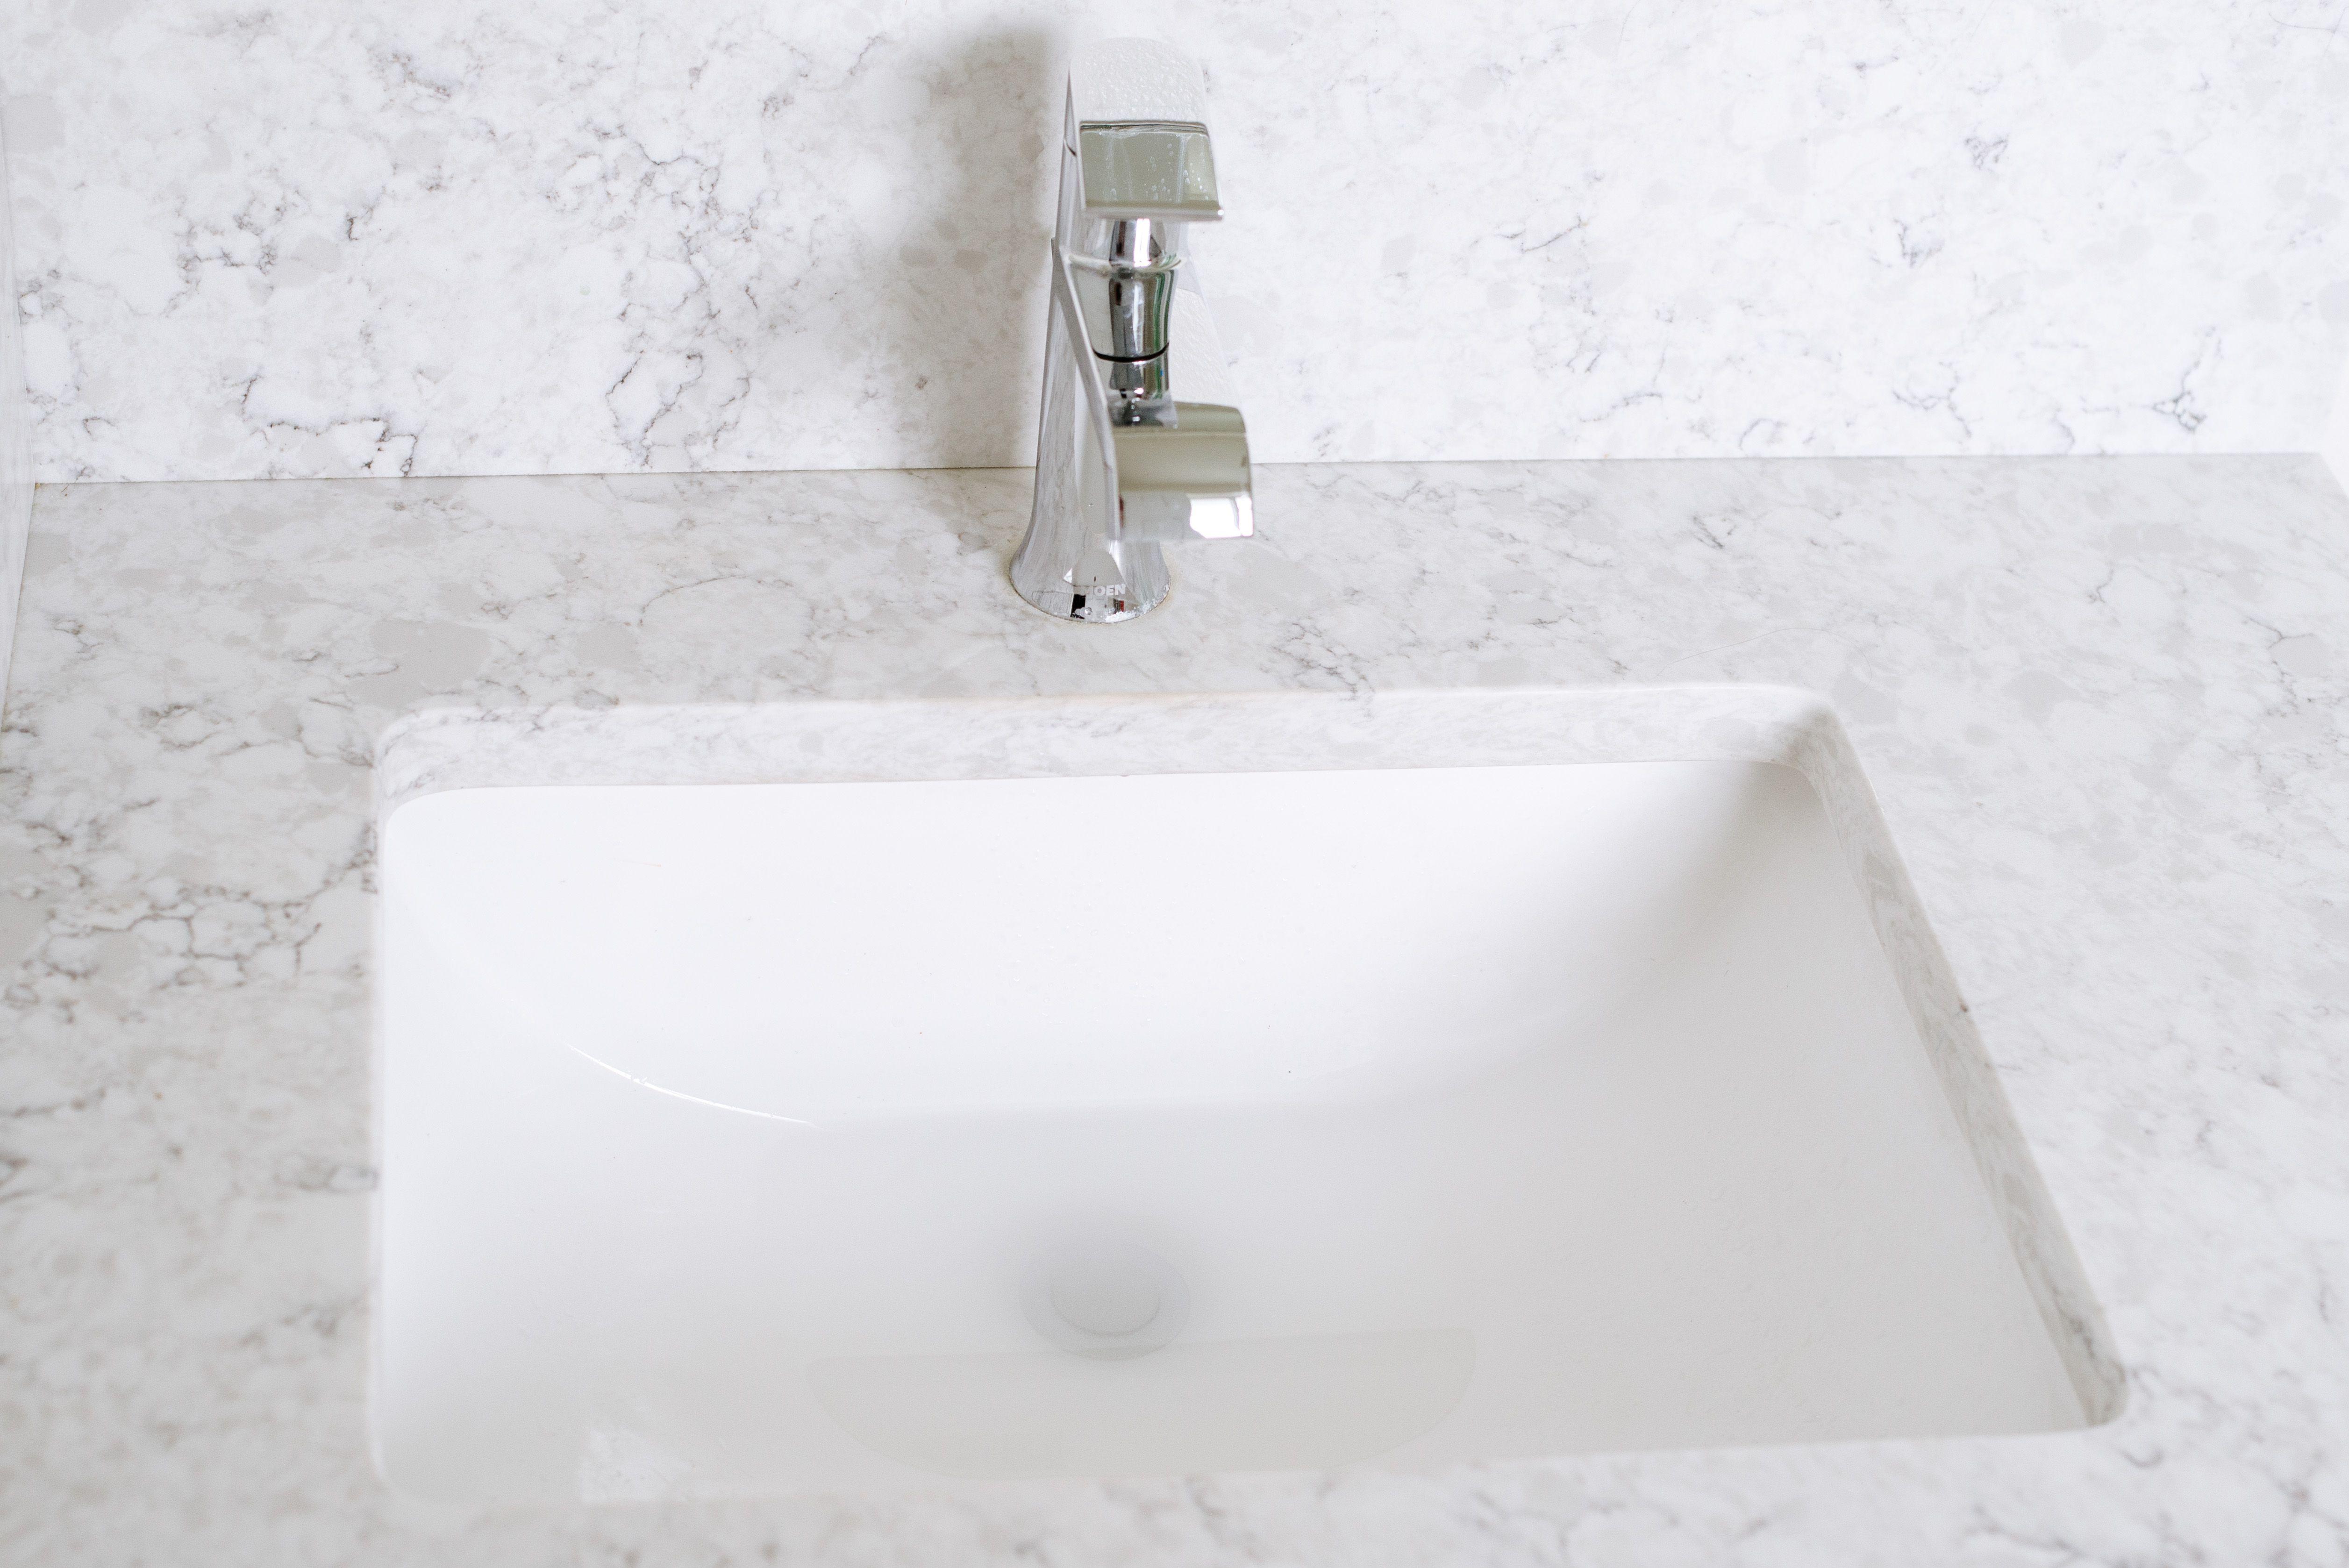 Five Ways To Fix A Slow Sink Drain, Slow Drain Bathroom Sink